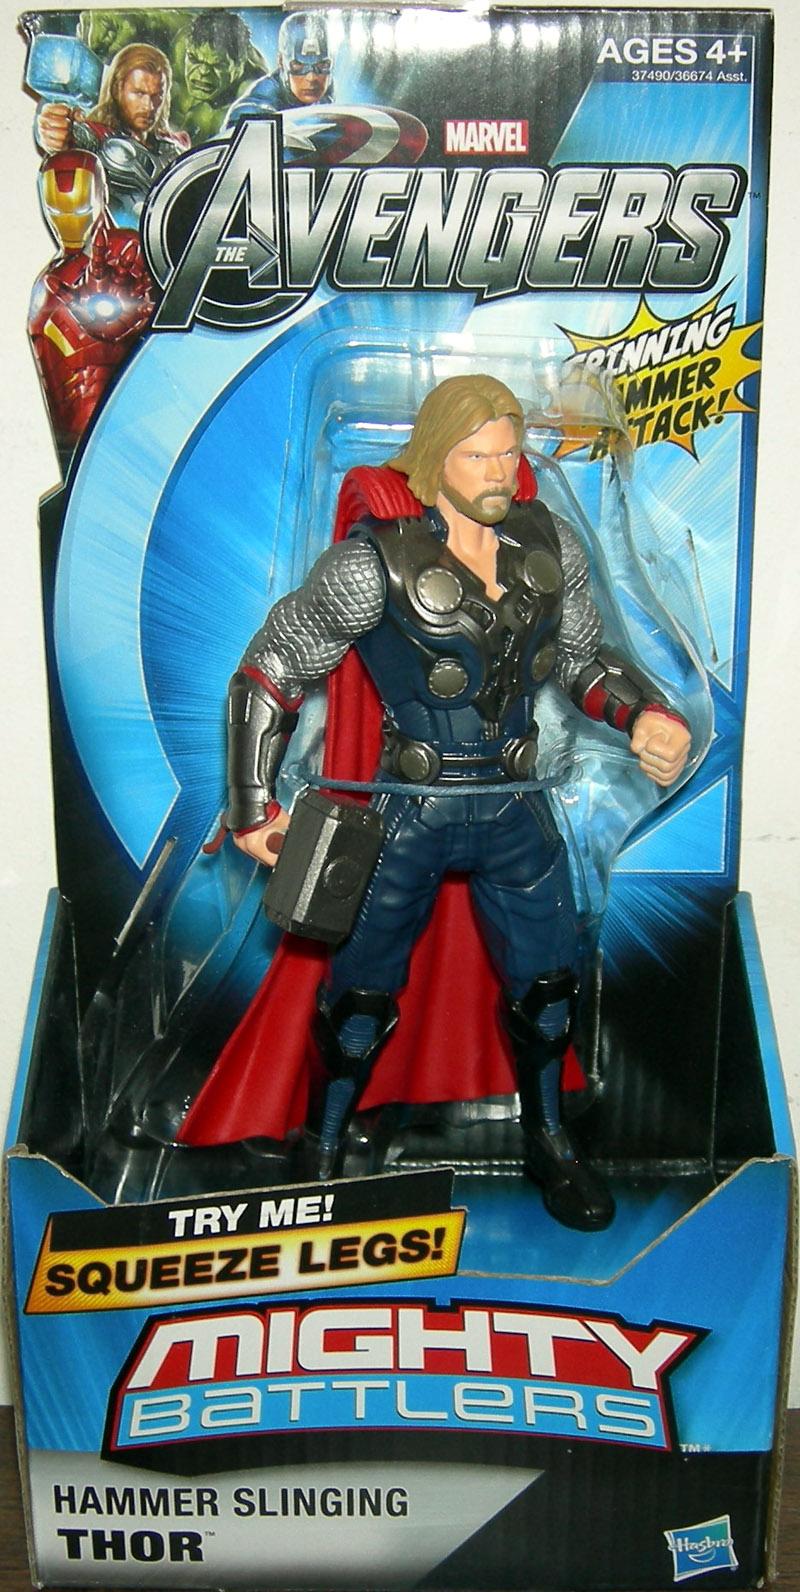 Hammer Slinging Thor Avengers Mighty Battlers